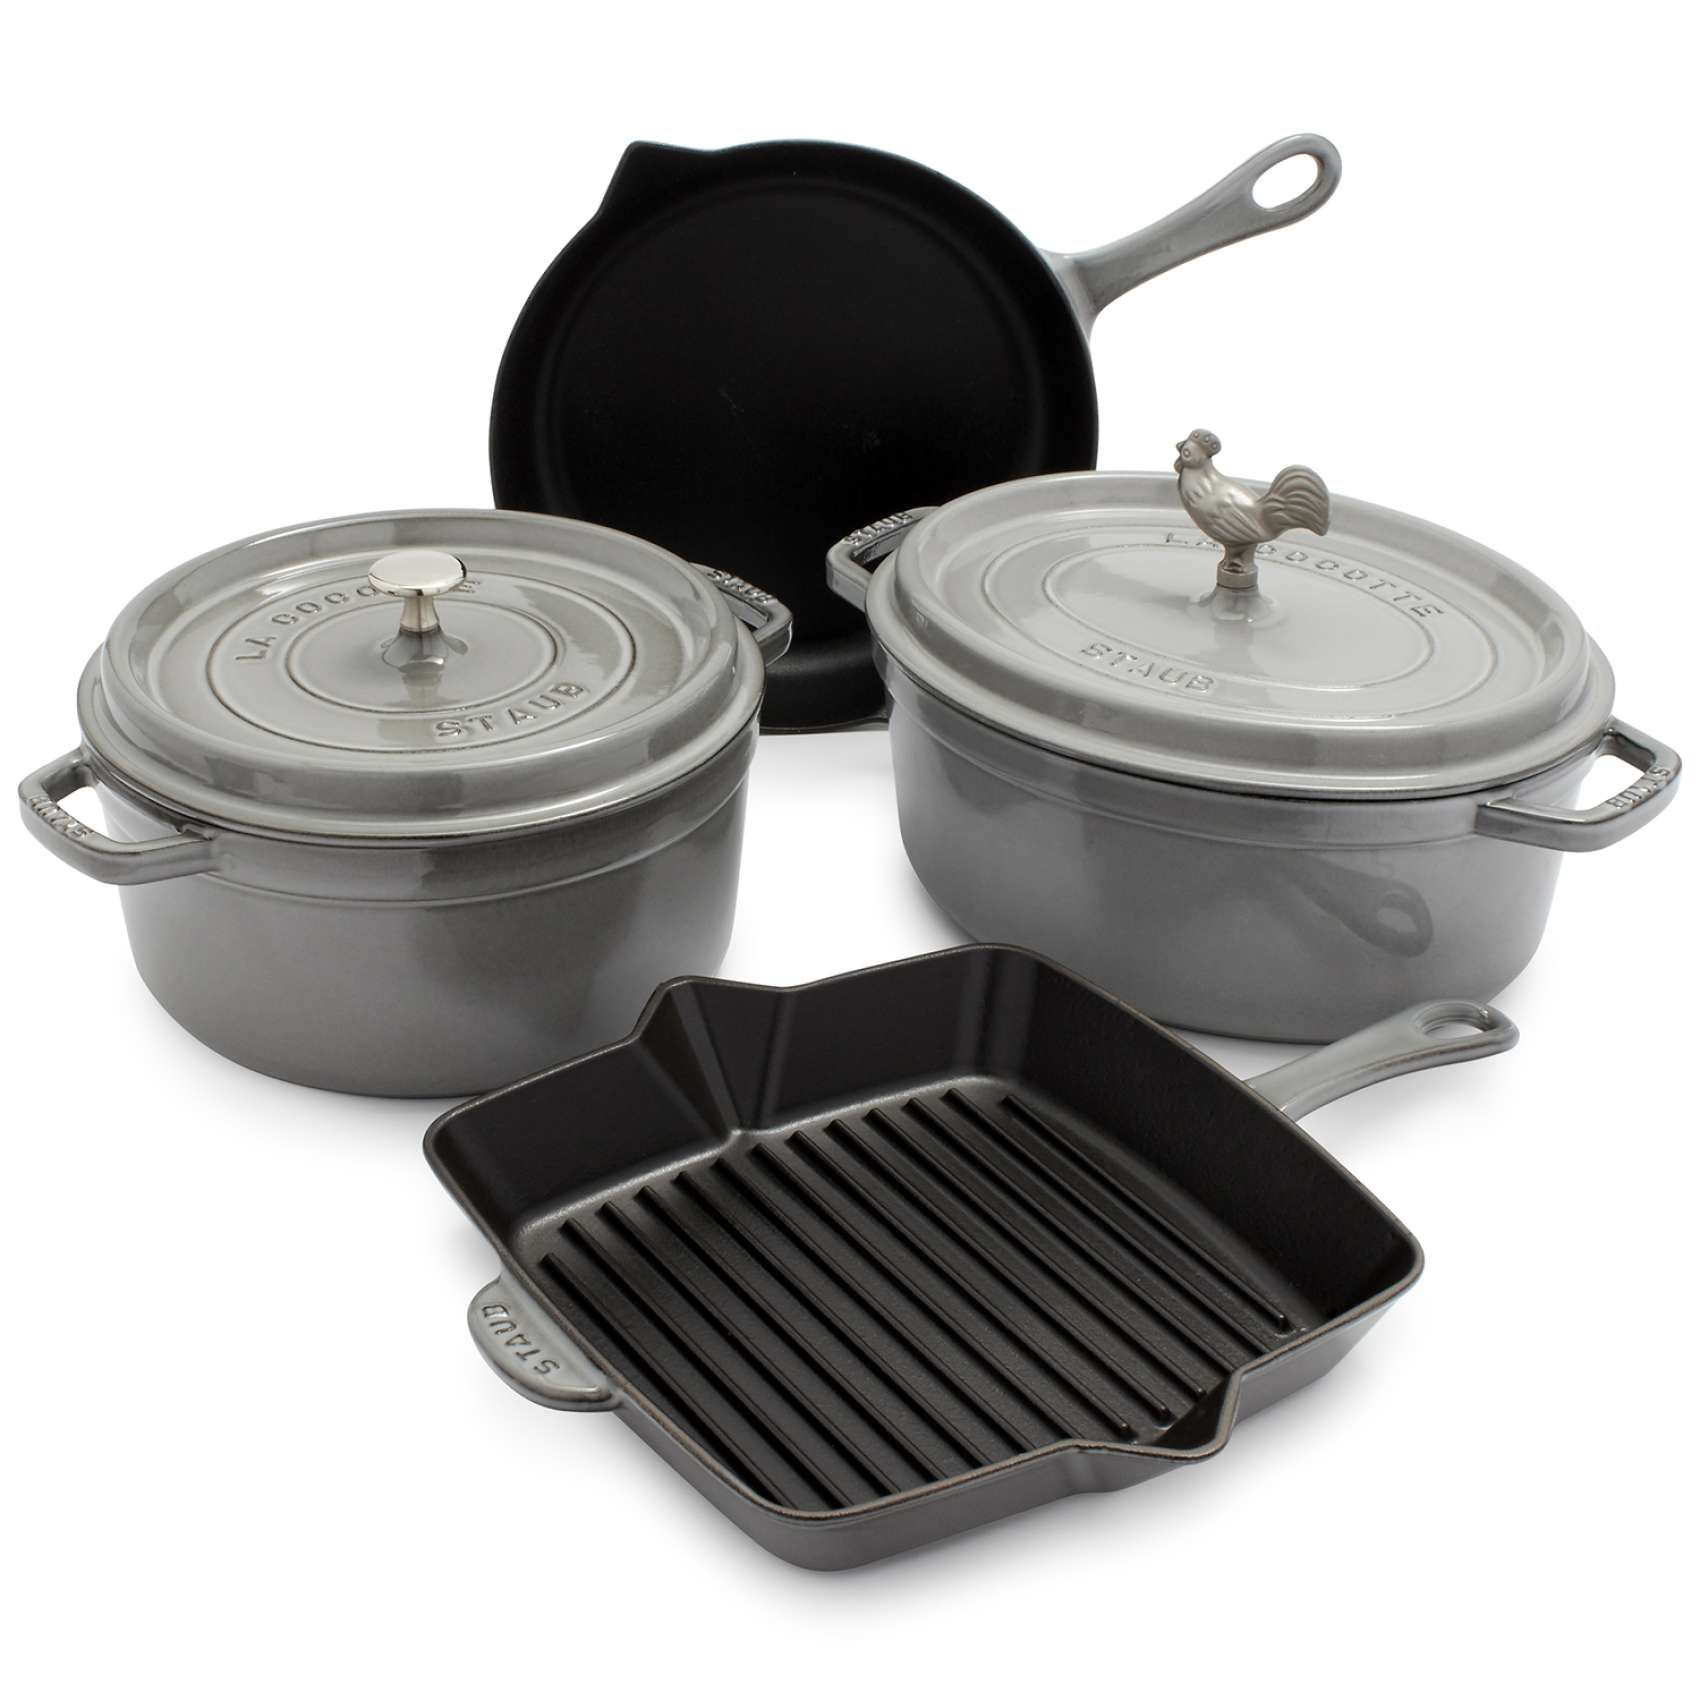 Staub 6-Piece Cookware Set | Cookware, Cookware set and Kitchens